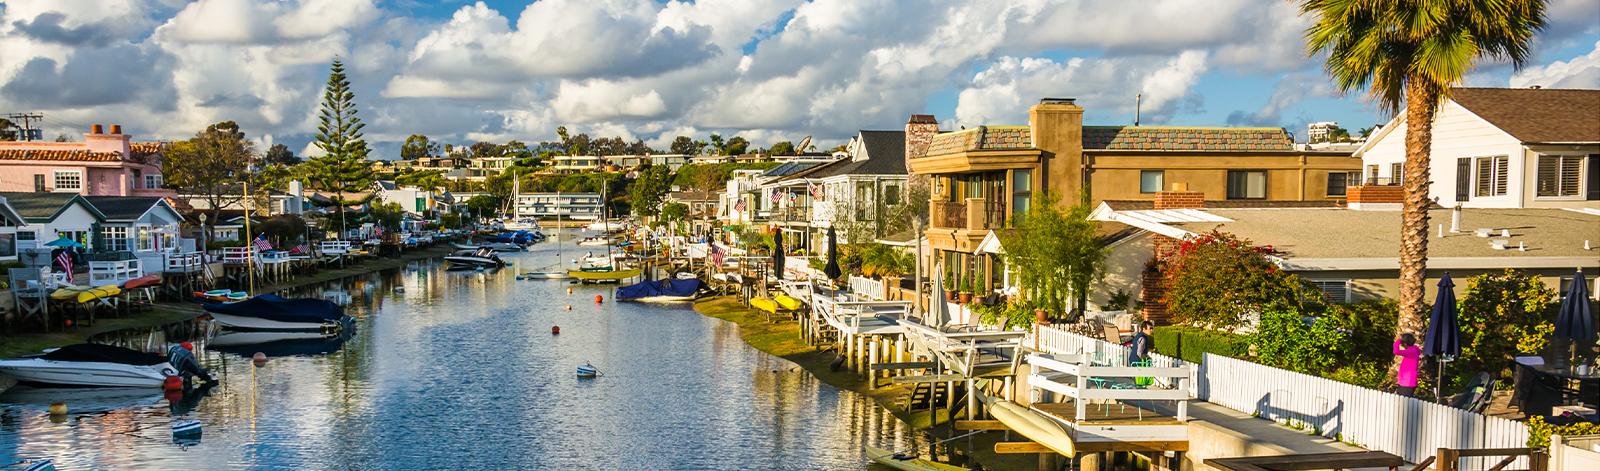 The Grand Canal, on Balboa Island, in Newport Beach, California